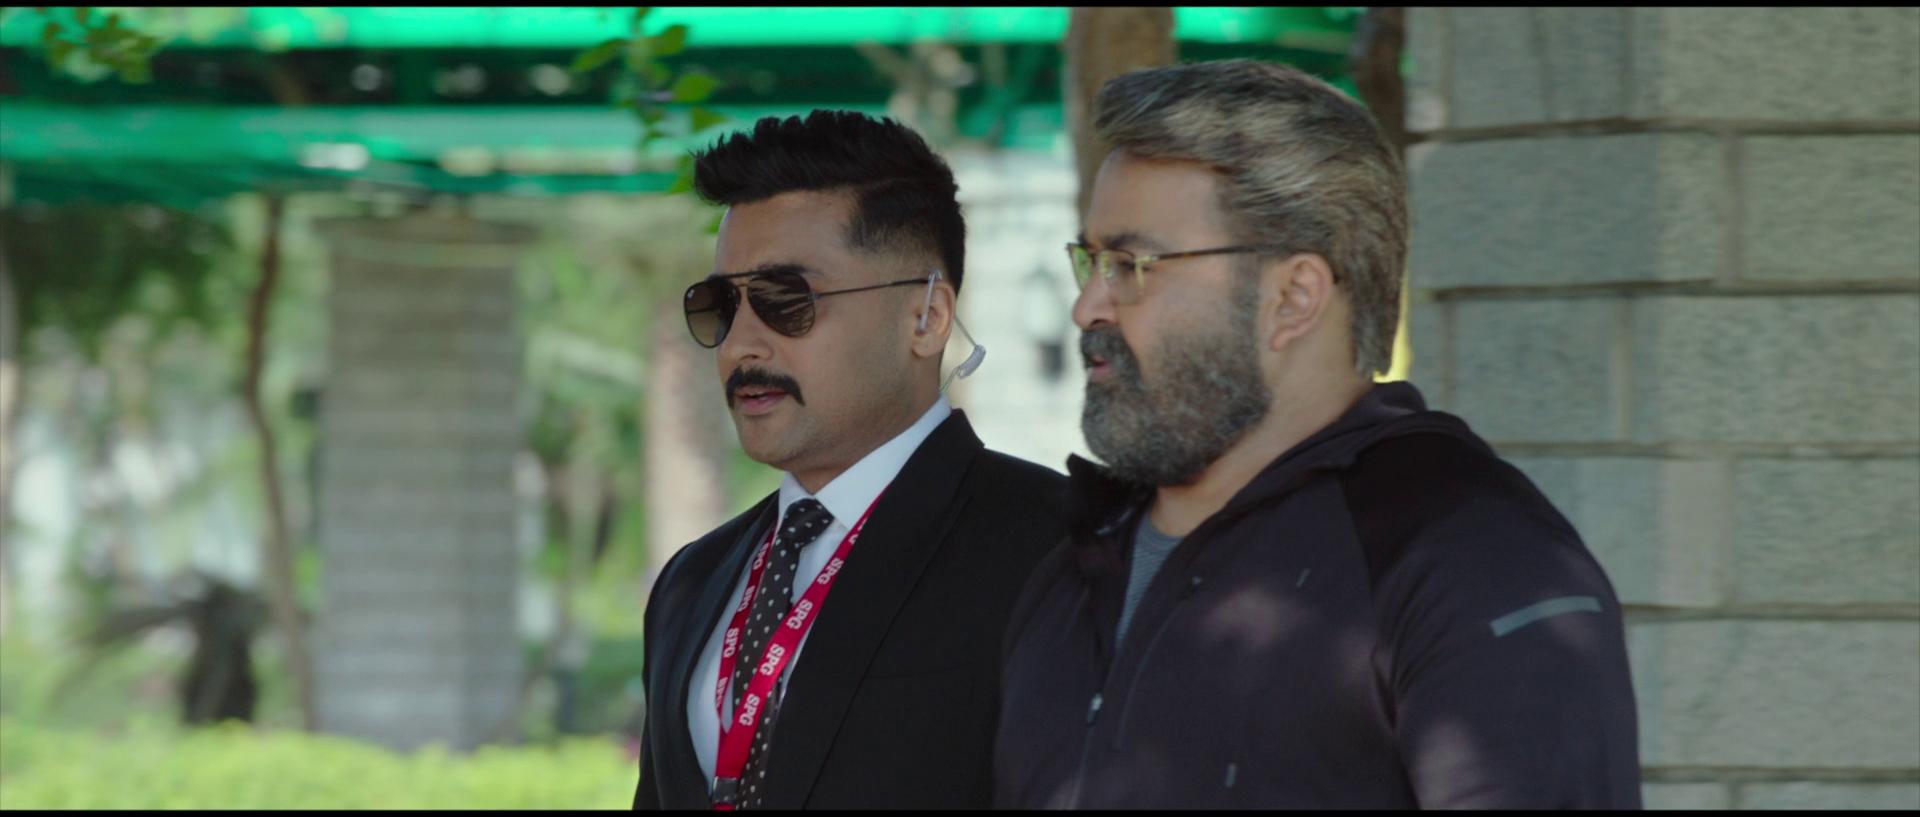 Kaappaan (2019) 1080p WEB-DL H264 DD5 1 Esubs [Dual Audio][Hindi+Tamil] DUS Exclusive